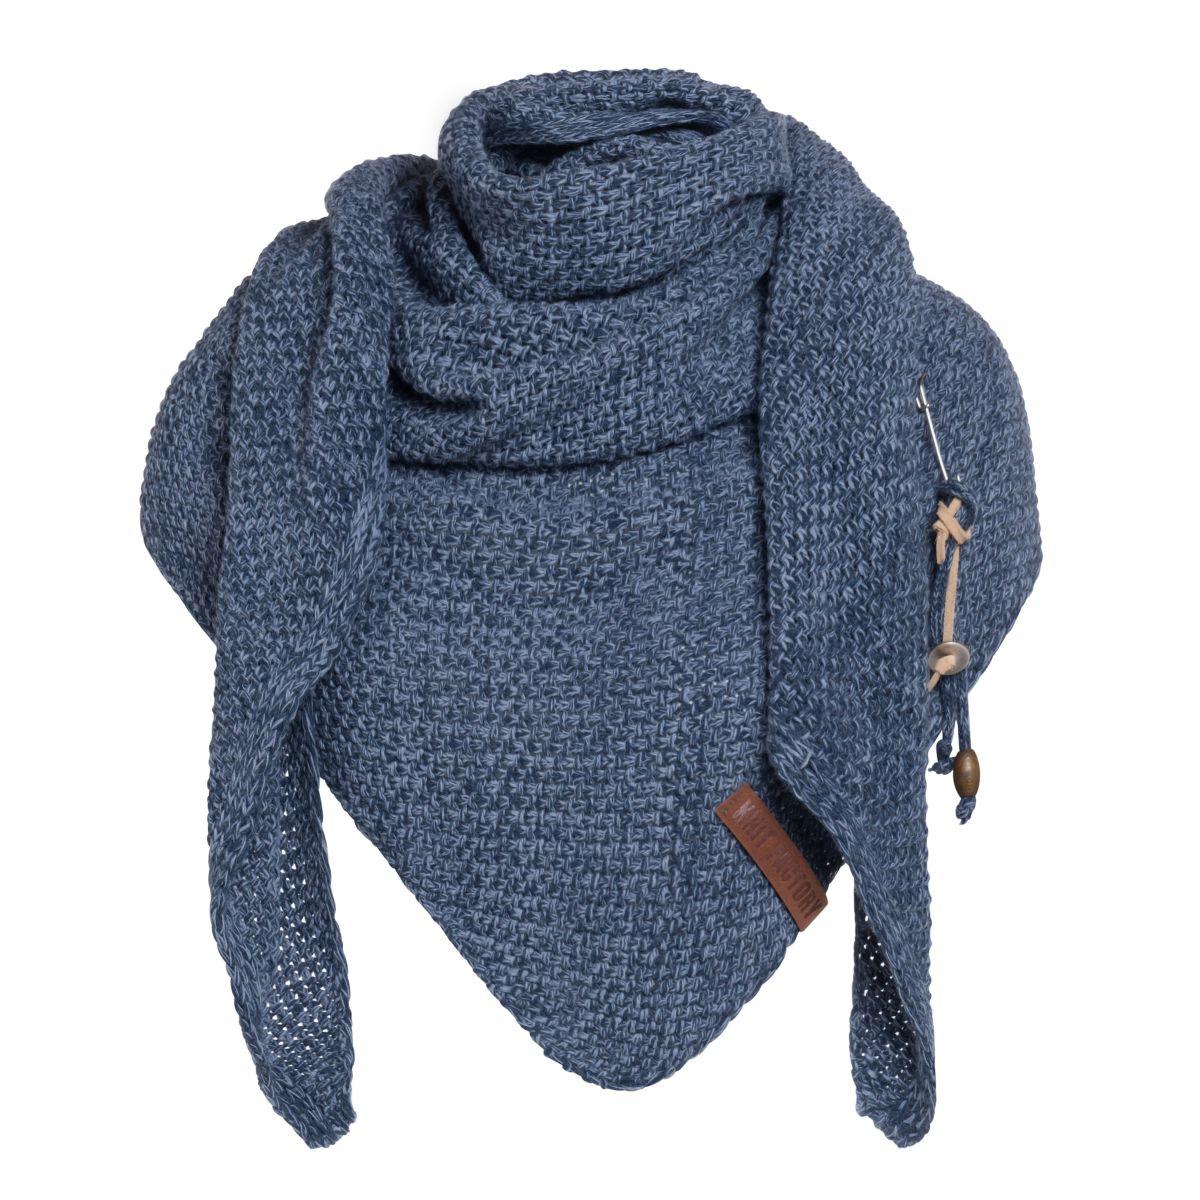 knit factory 1206054 coco omslagdoek jeans indigo 1